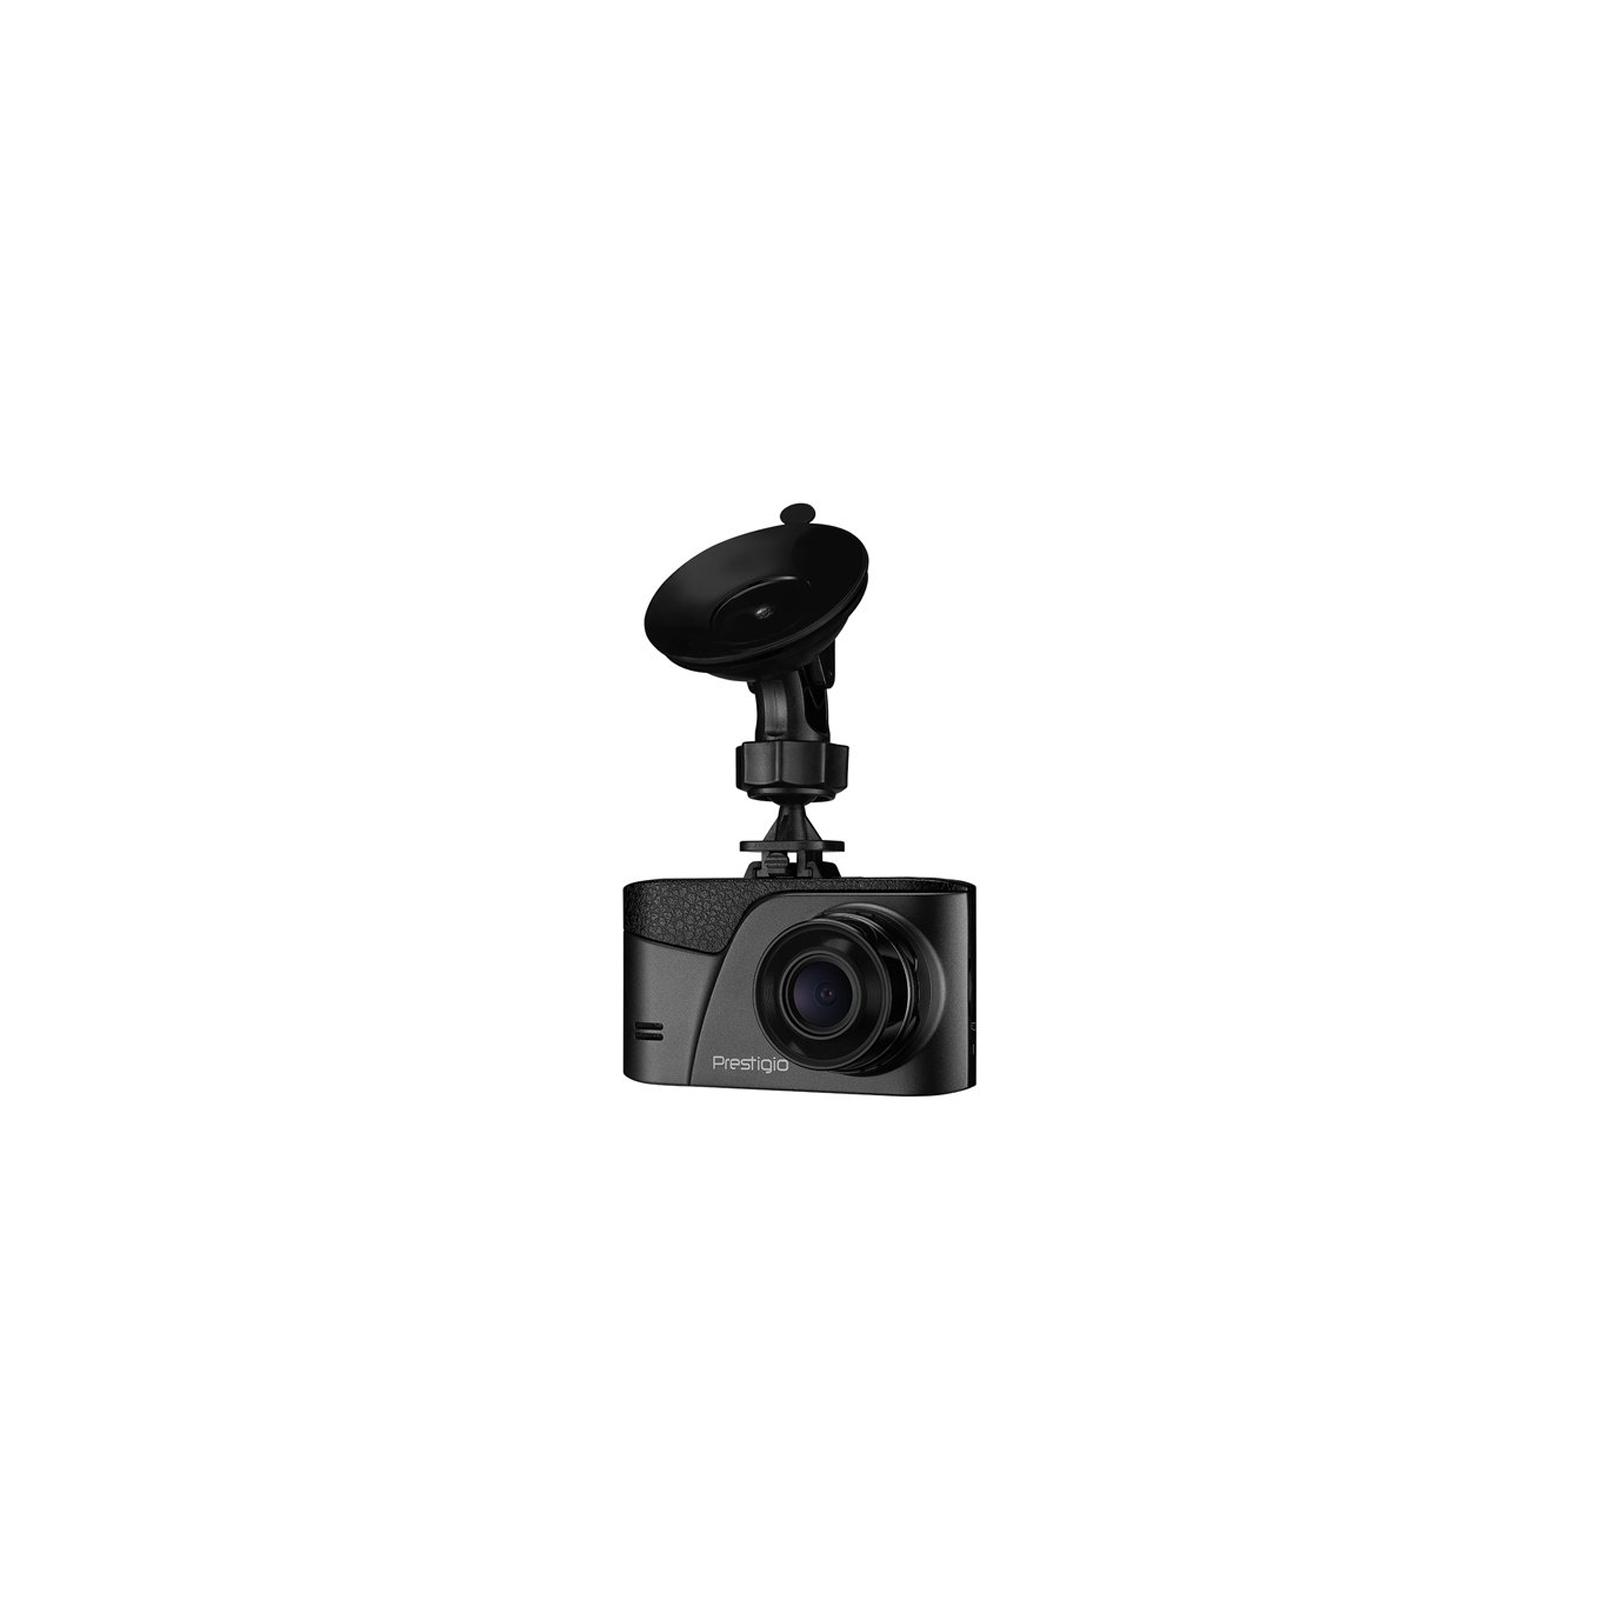 Видеорегистратор Prestigio RoadRunner 345 (PCDVRR345) изображение 5